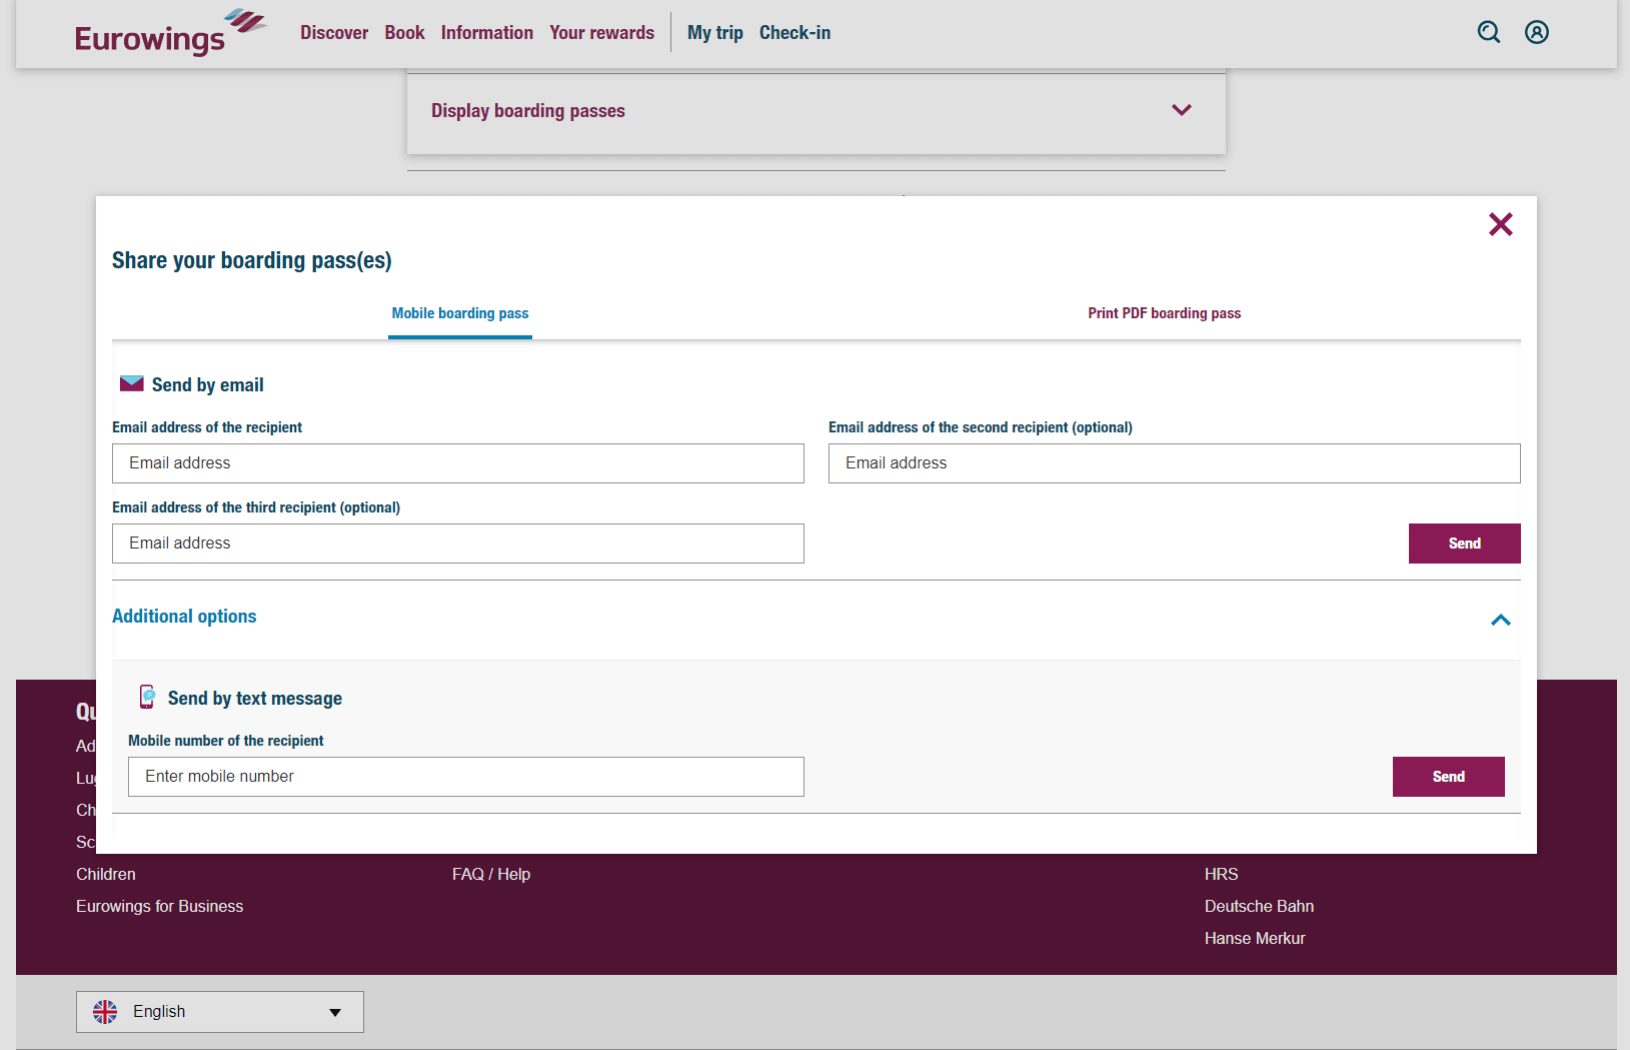 Eurowings Check-in – Zaslanie palubnej vstupenky